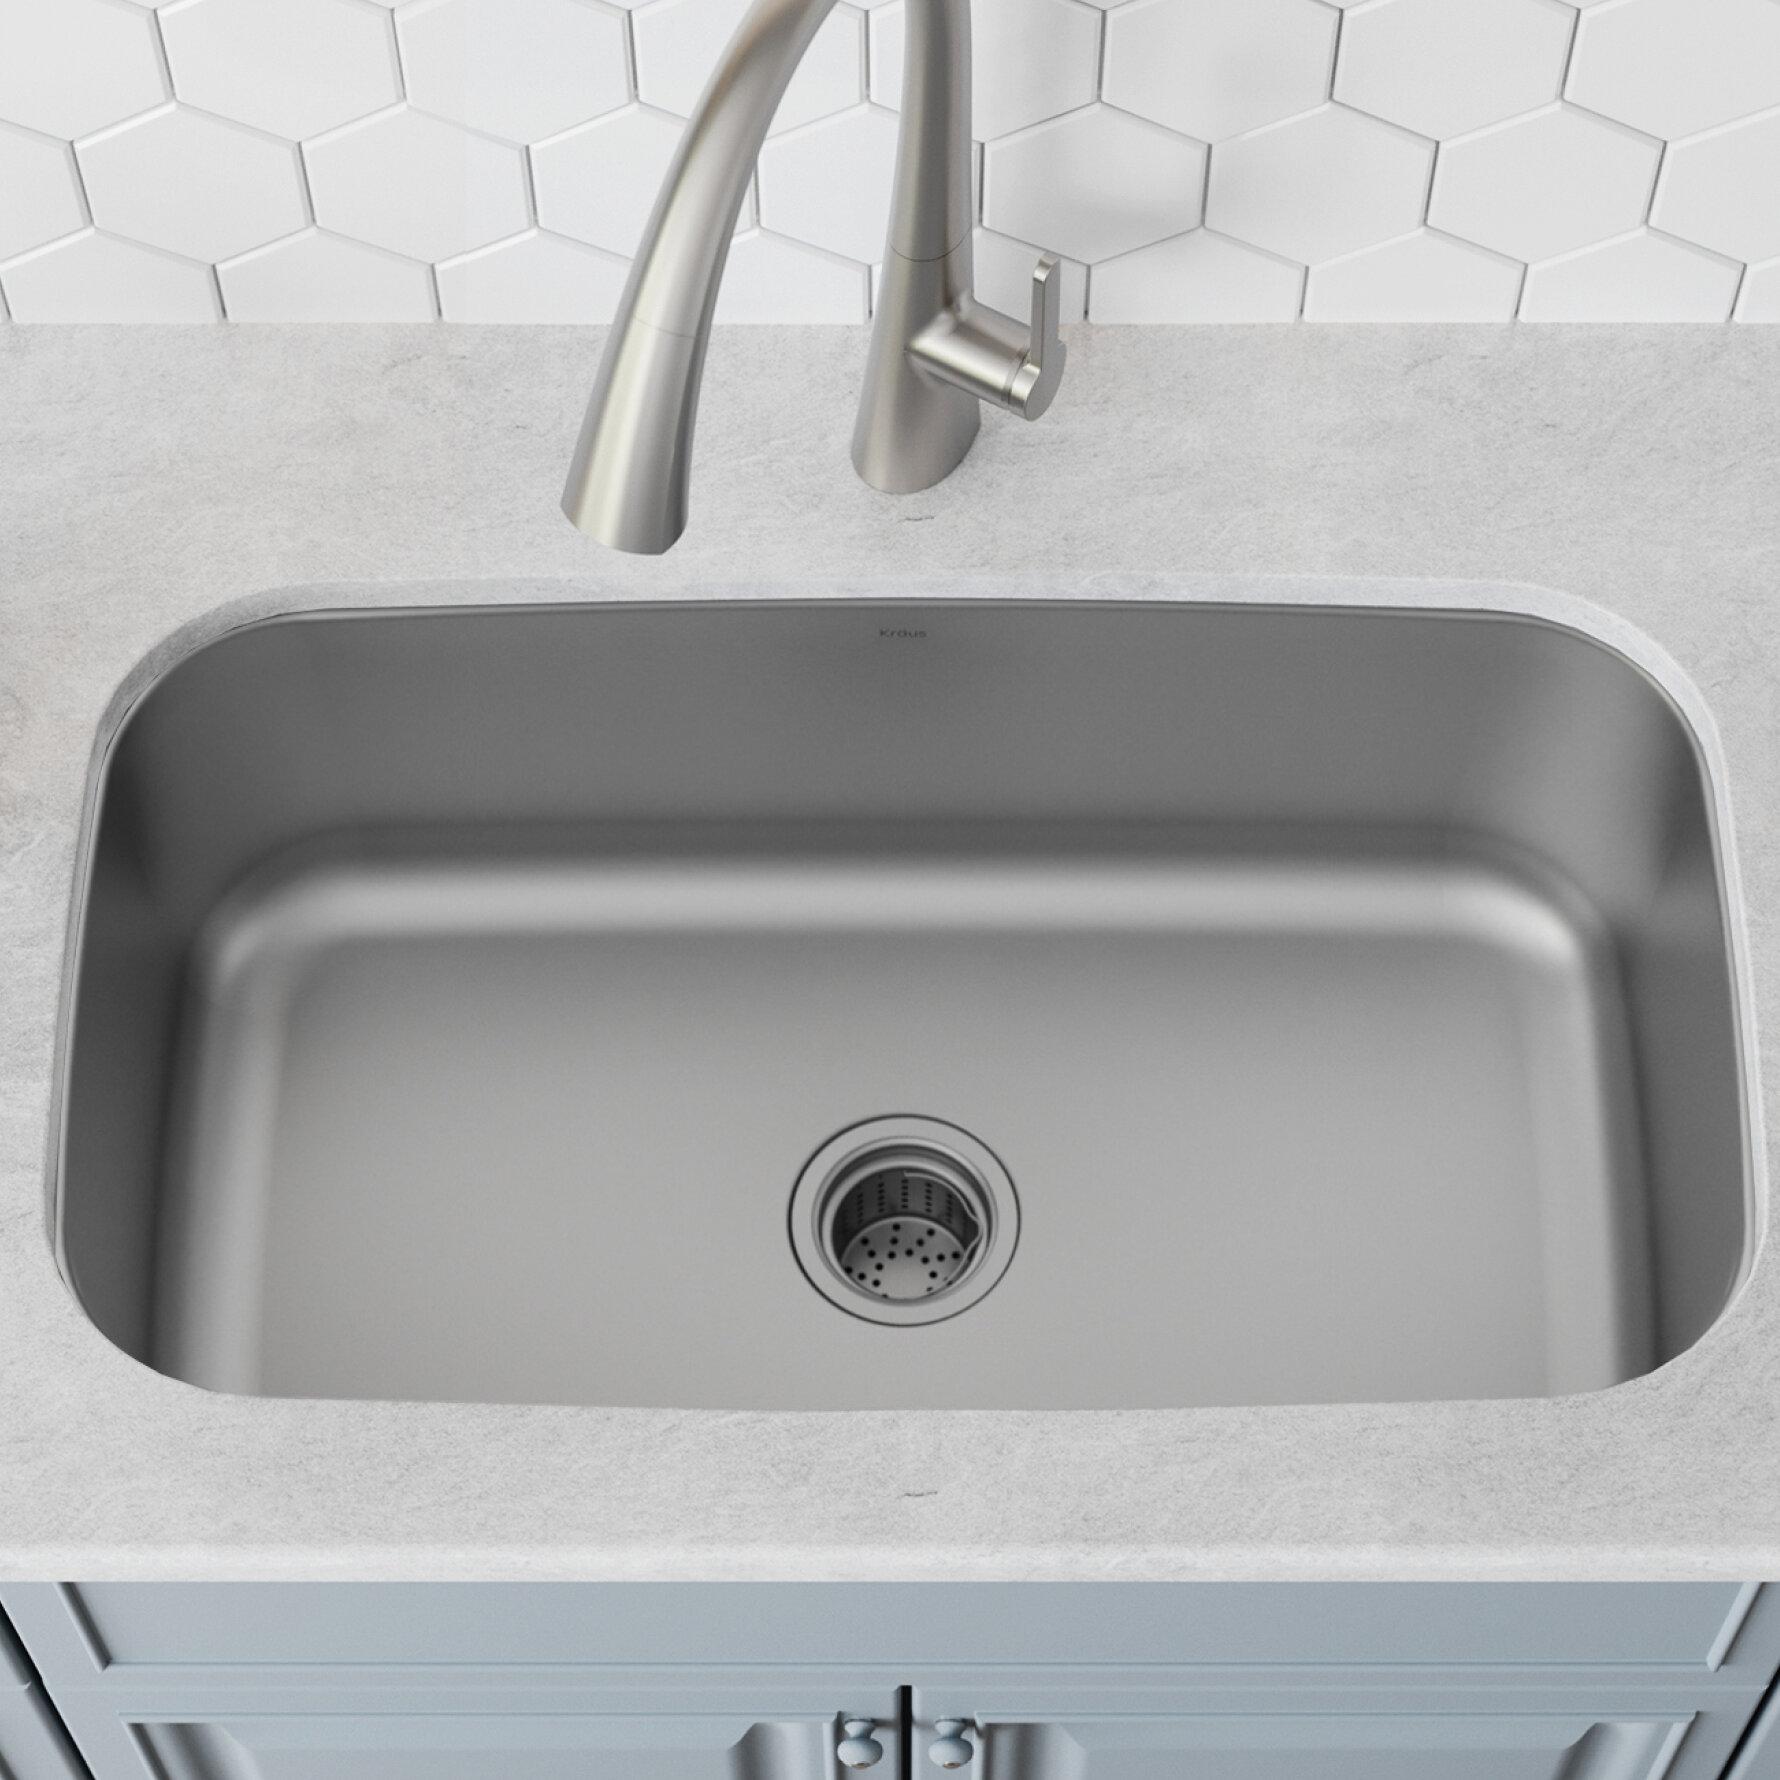 Kbu14 Kraus Stainless Steel 32 L X 19 W Undermount Kitchen Sink With Drain Embly Reviews Wayfair